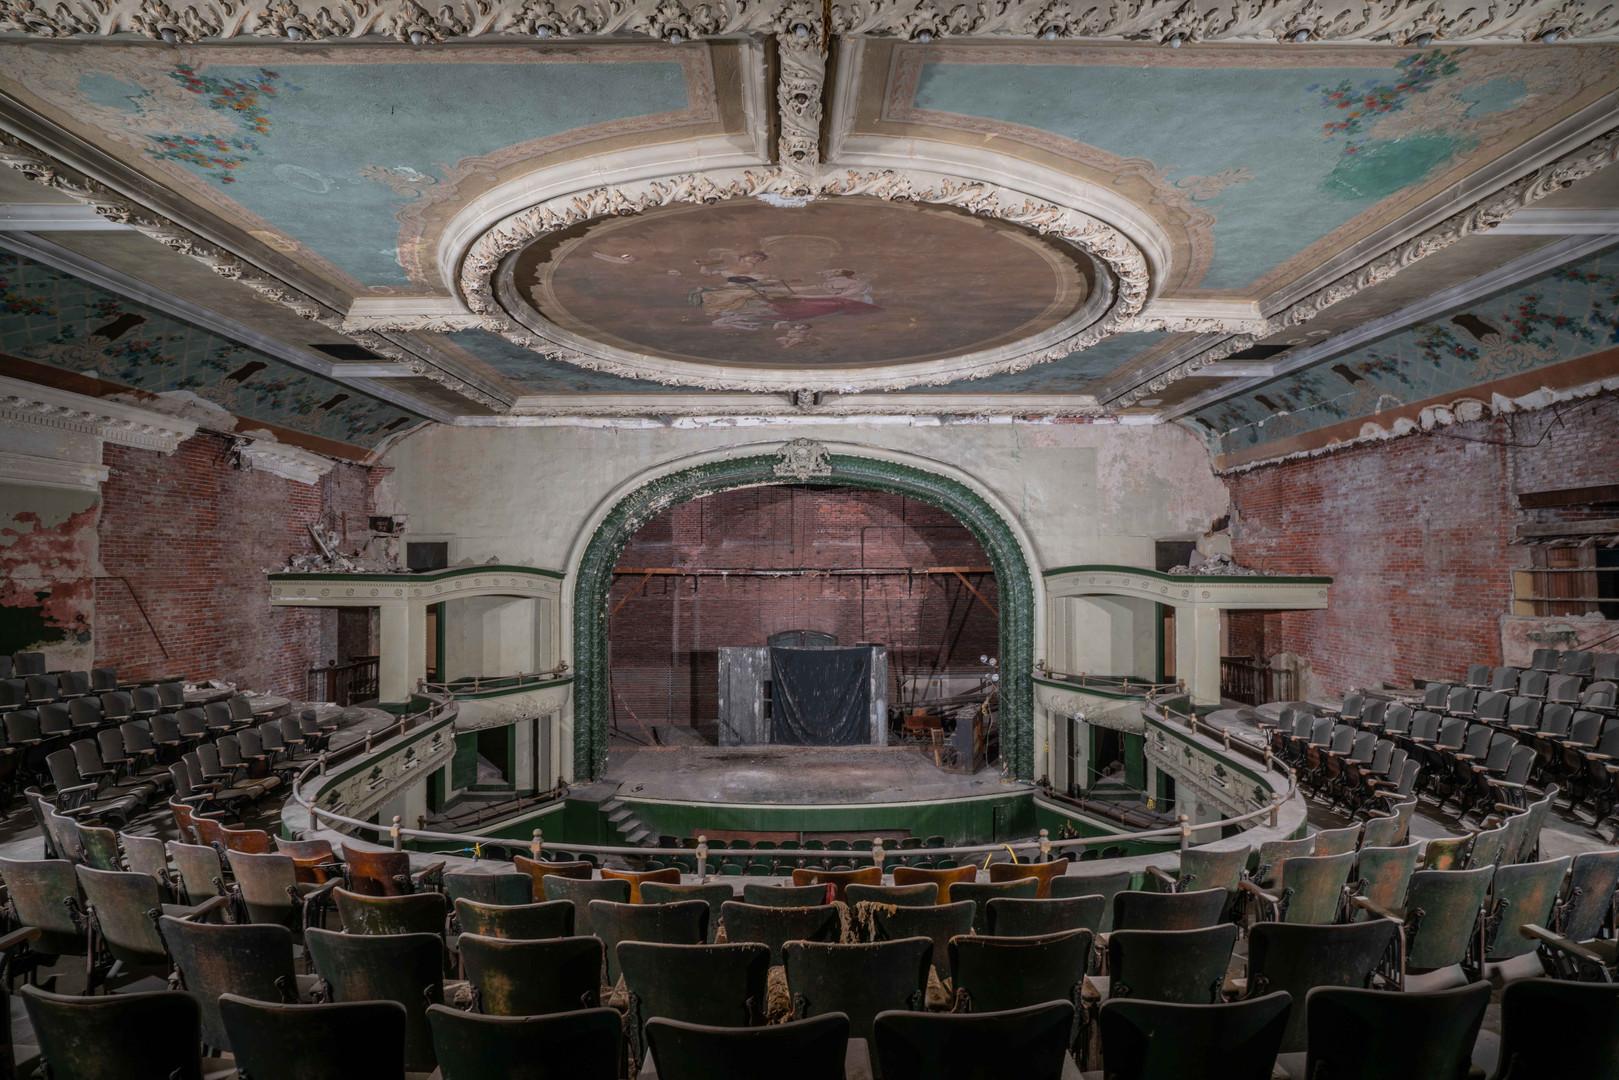 The Grand Orpheum Theater